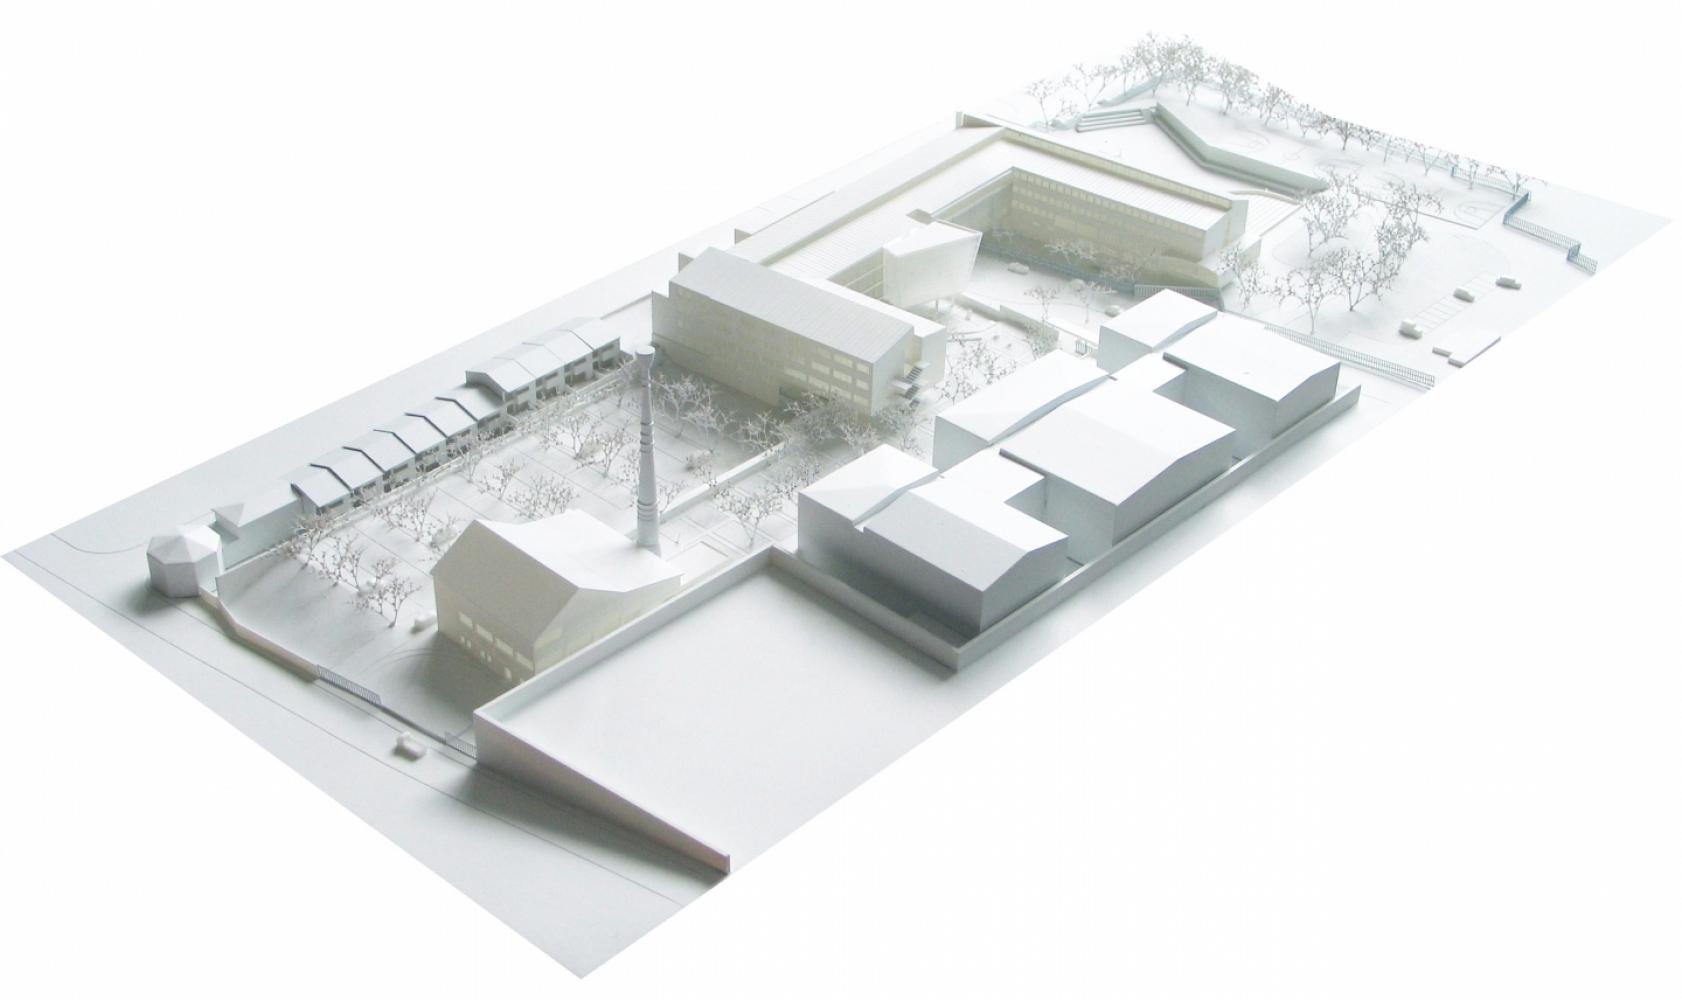 epernay01 Pascale SEURIN Architecte - Pascale SEURIN Architecte